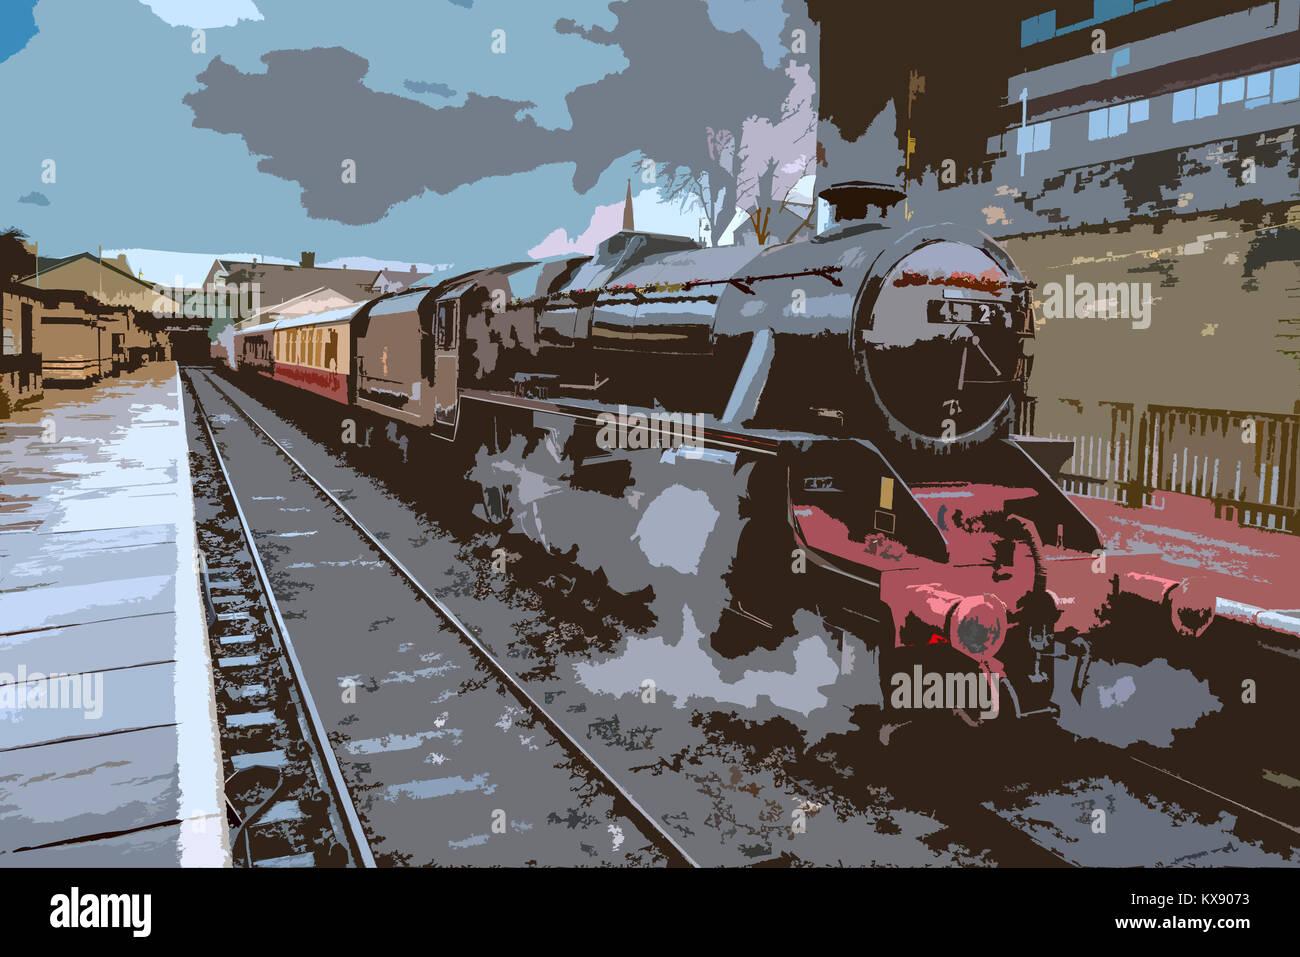 London Midland & Scottish Railway Class 5MT ('Black 5') 4-6-0 No. 45212 East Lancashire Railway. Bury - Stock Image